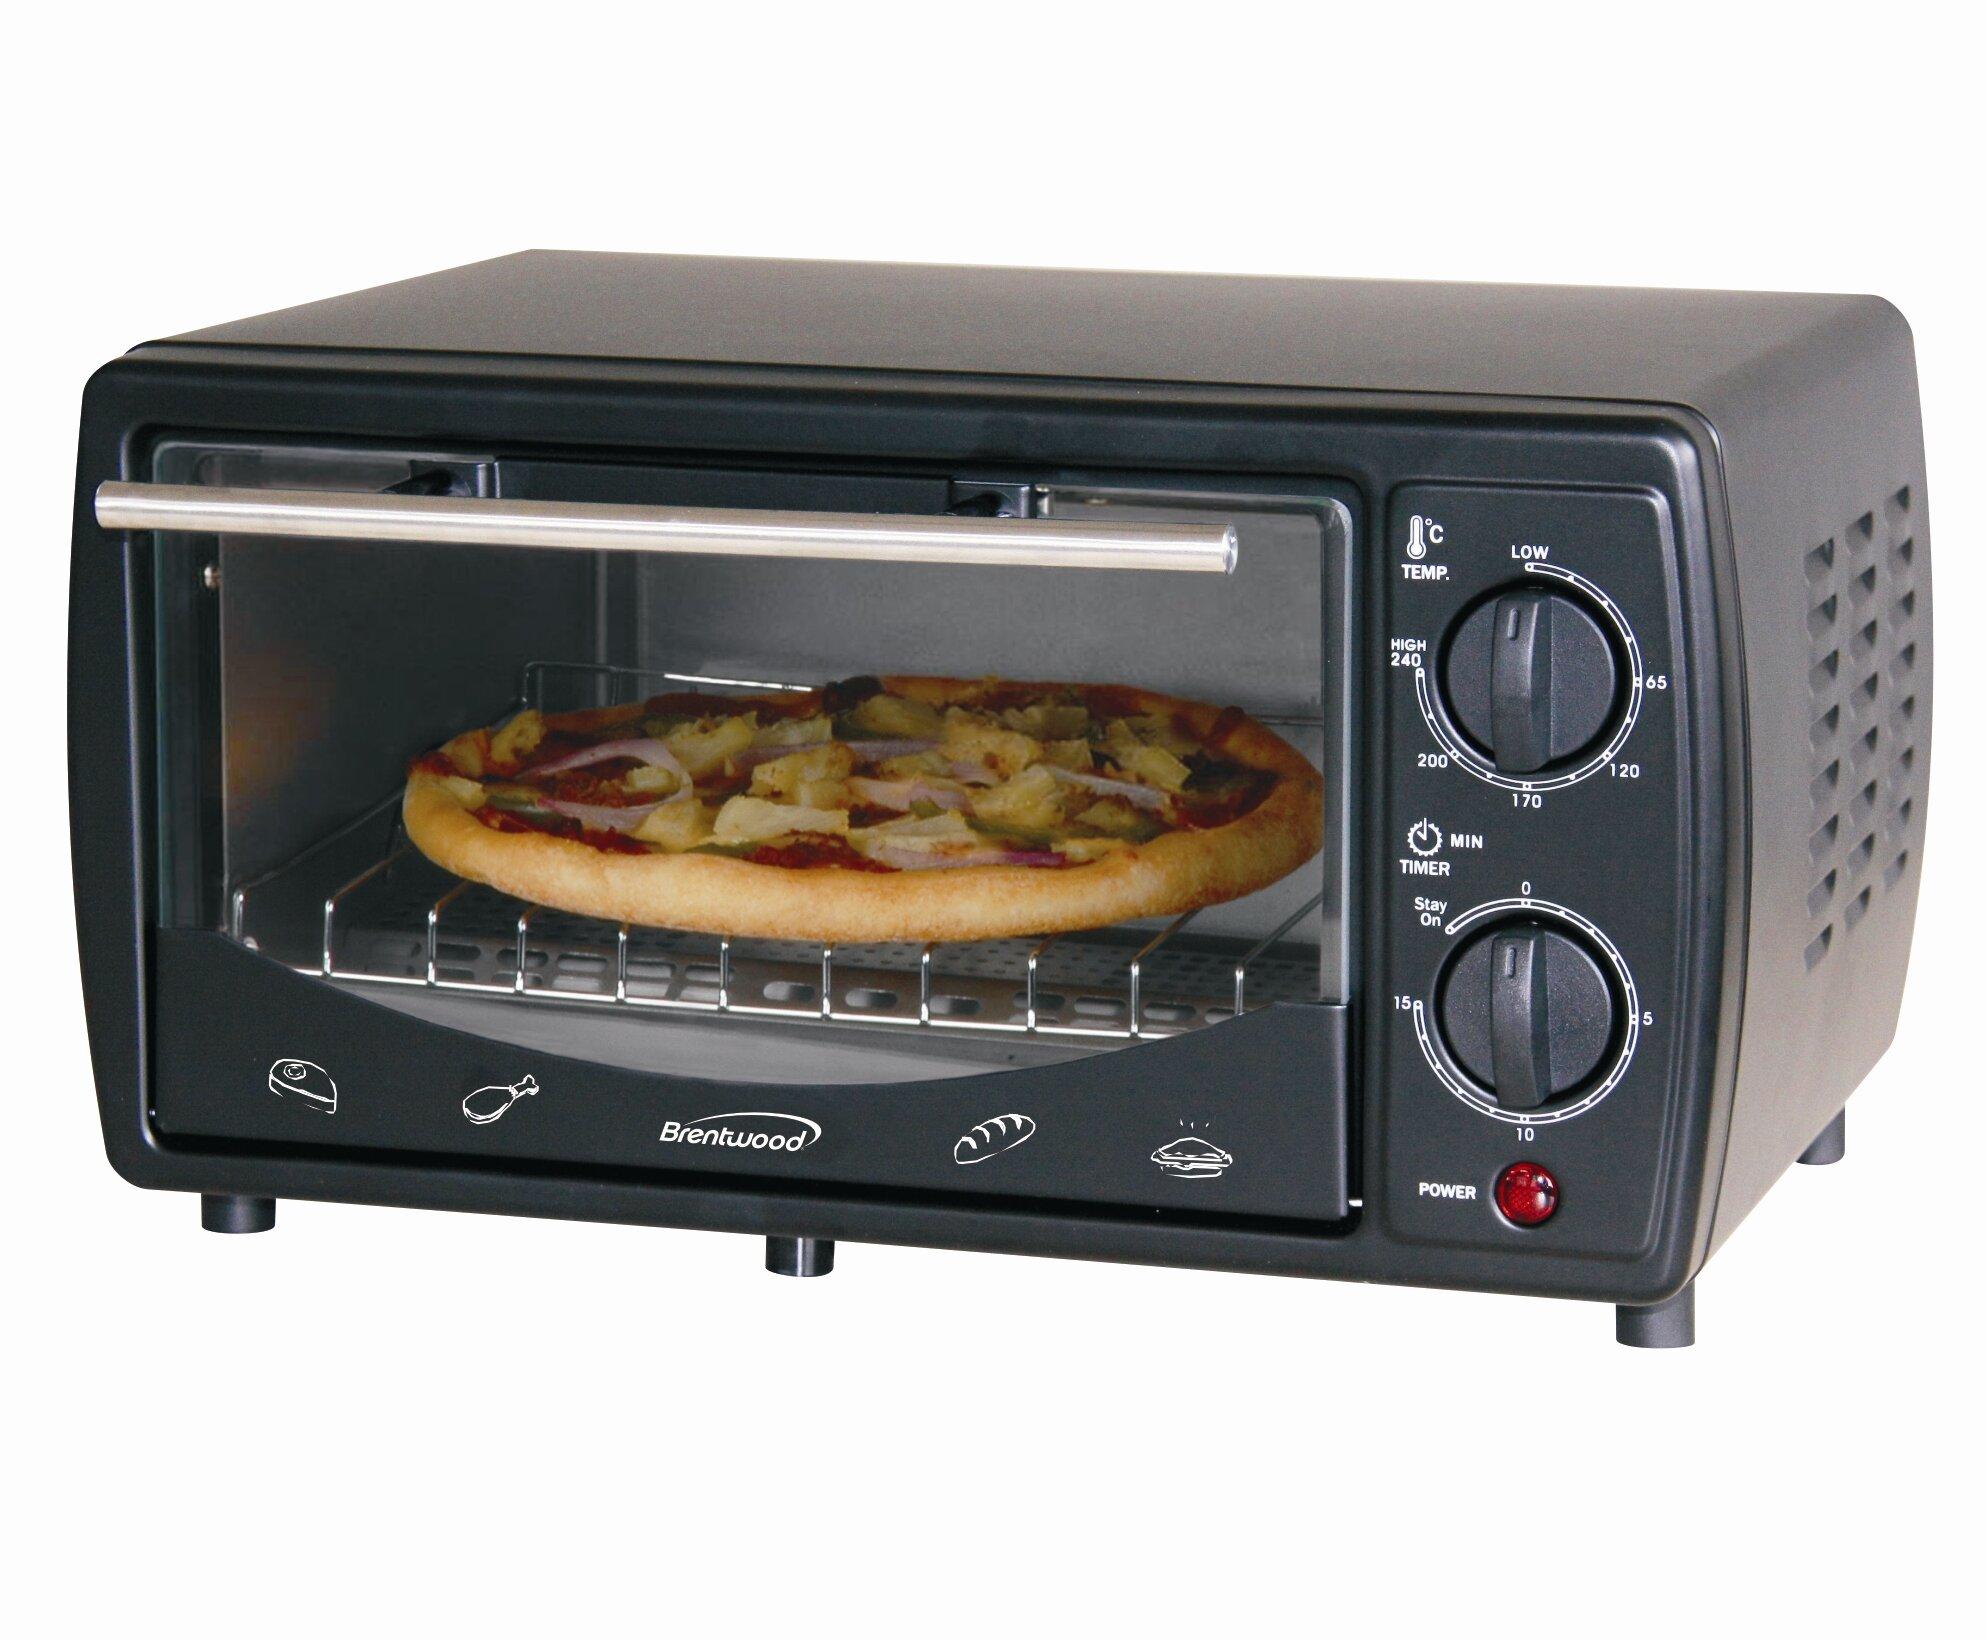 Countertop Oven Que Es : Caracter?sticas del art?culo